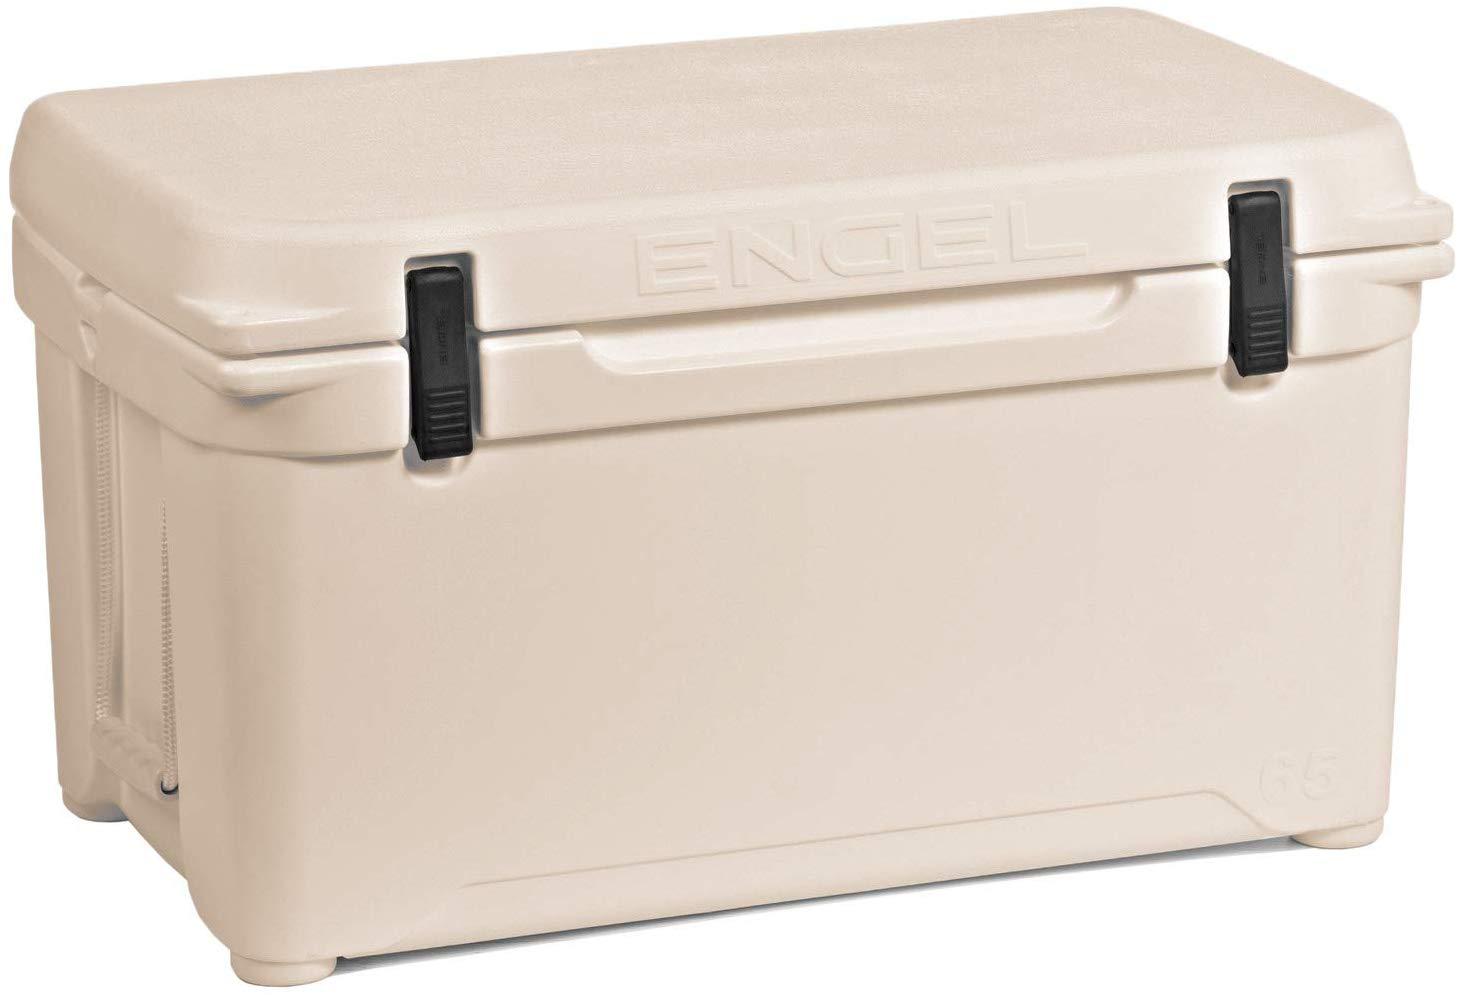 Engel 65 high-performance hard cooler